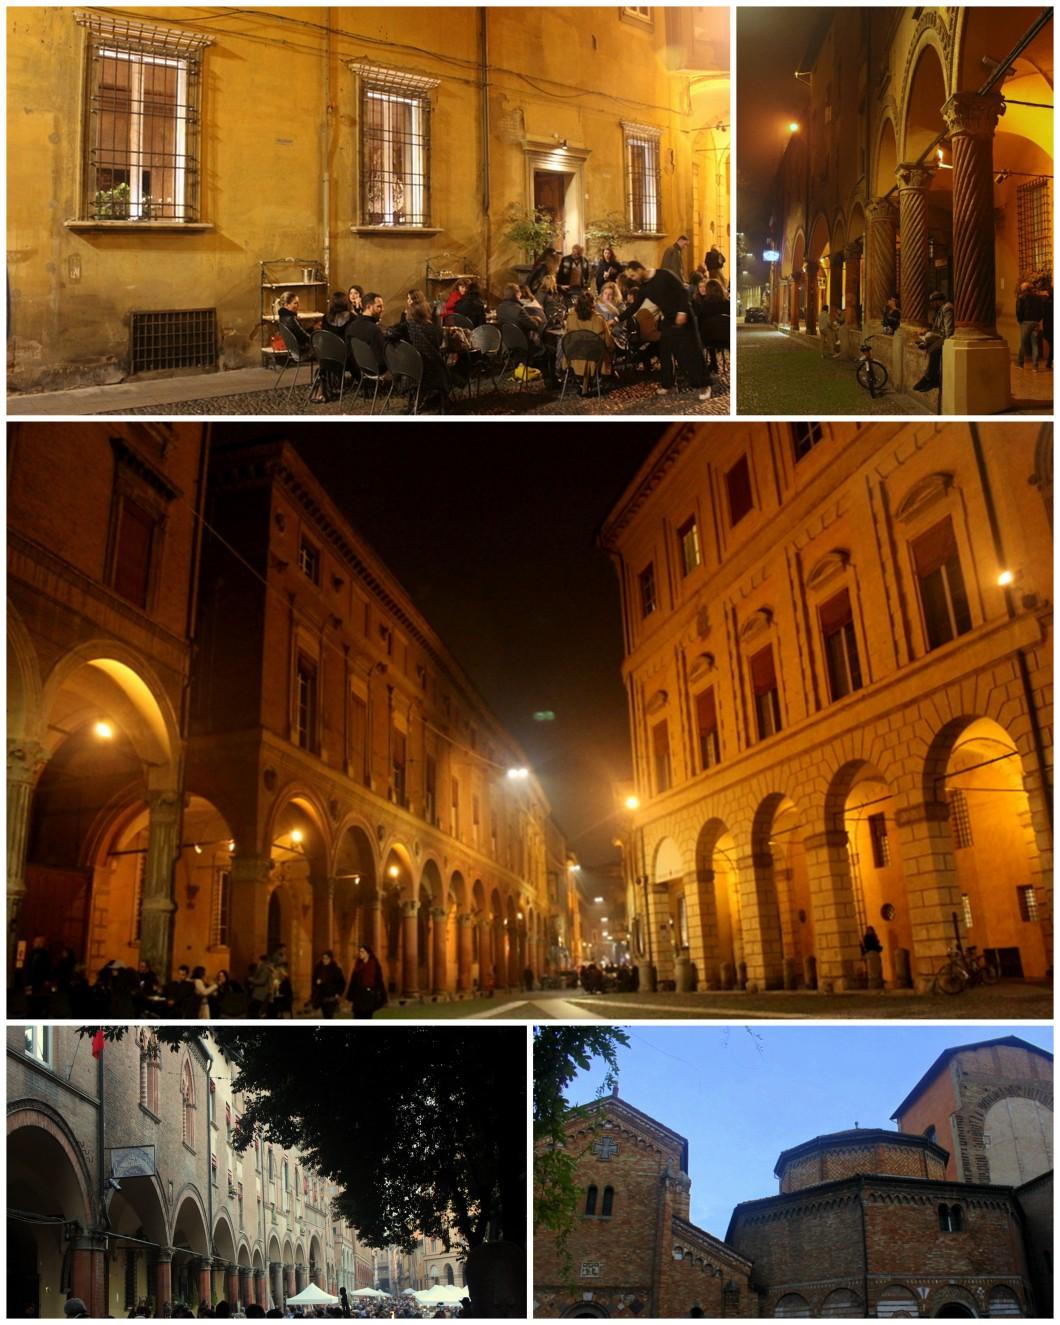 Italy Bologna Piazza San Stefano.jpg